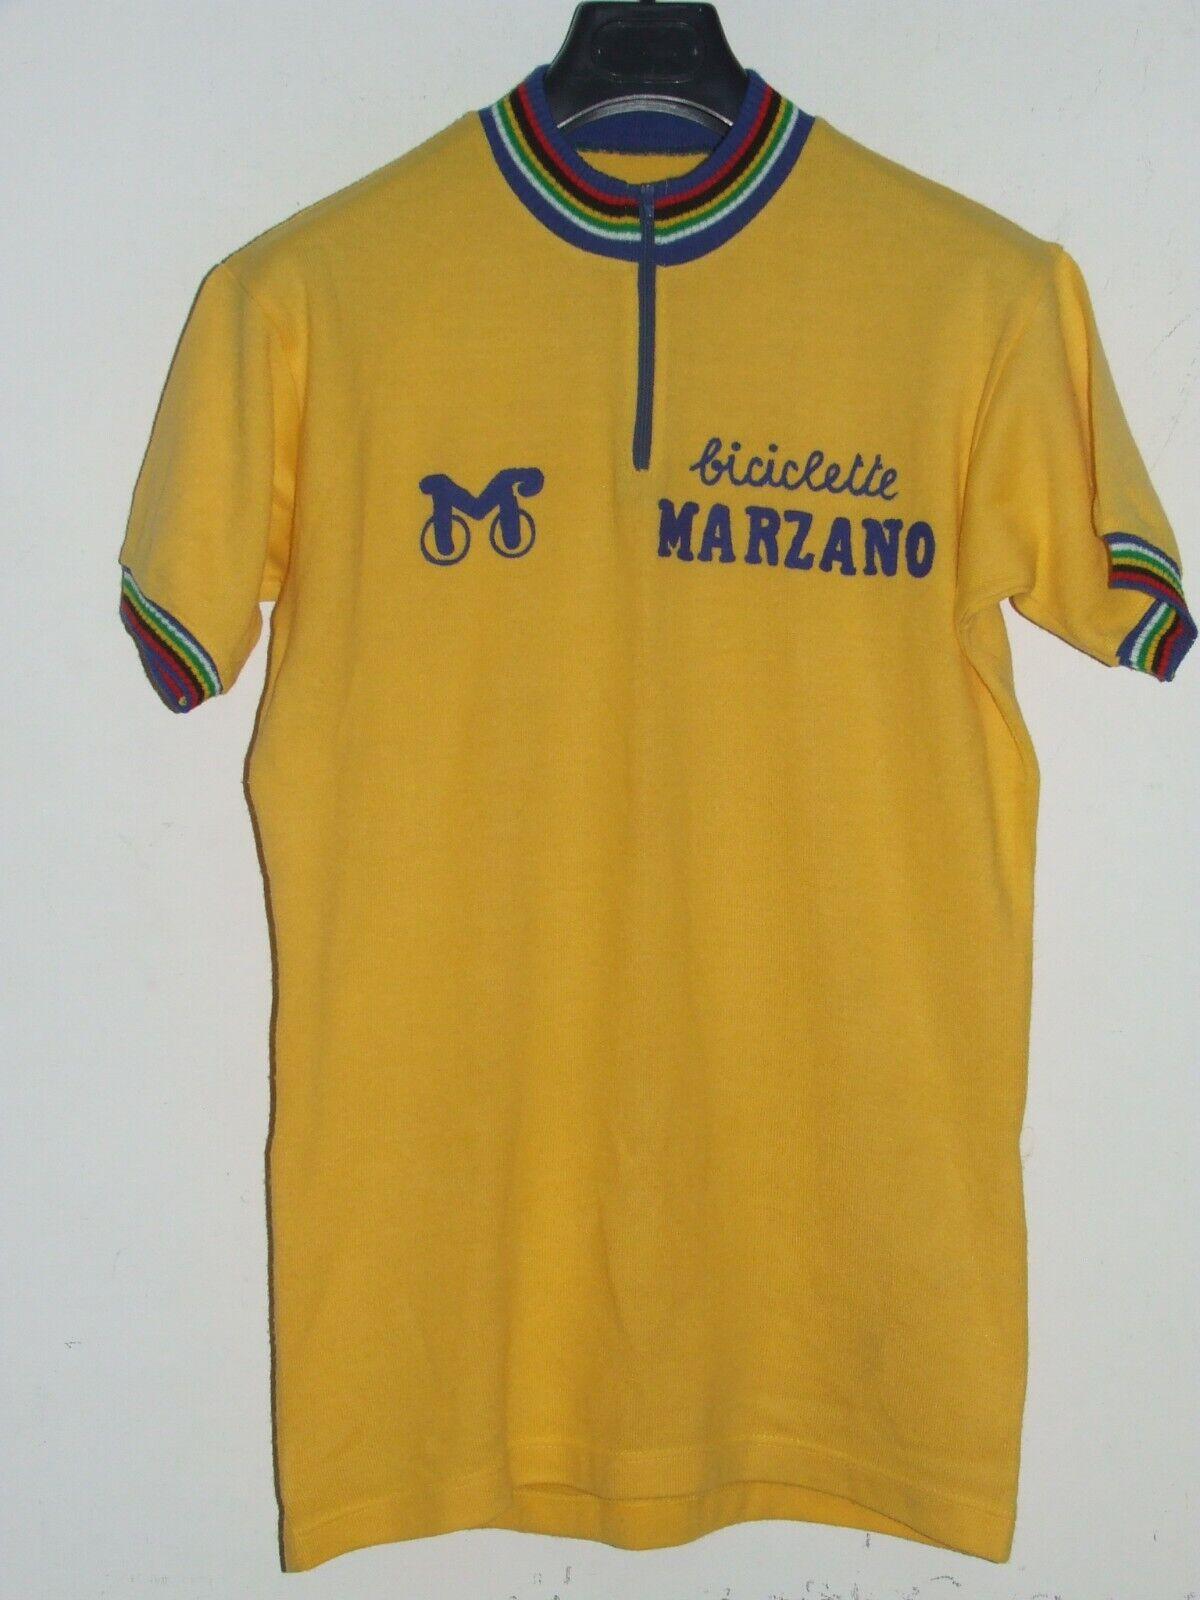 Jersey Fahrrad Jersey Maillot Radfahren Eroica Vintage 70'S Marzano 50% Wool